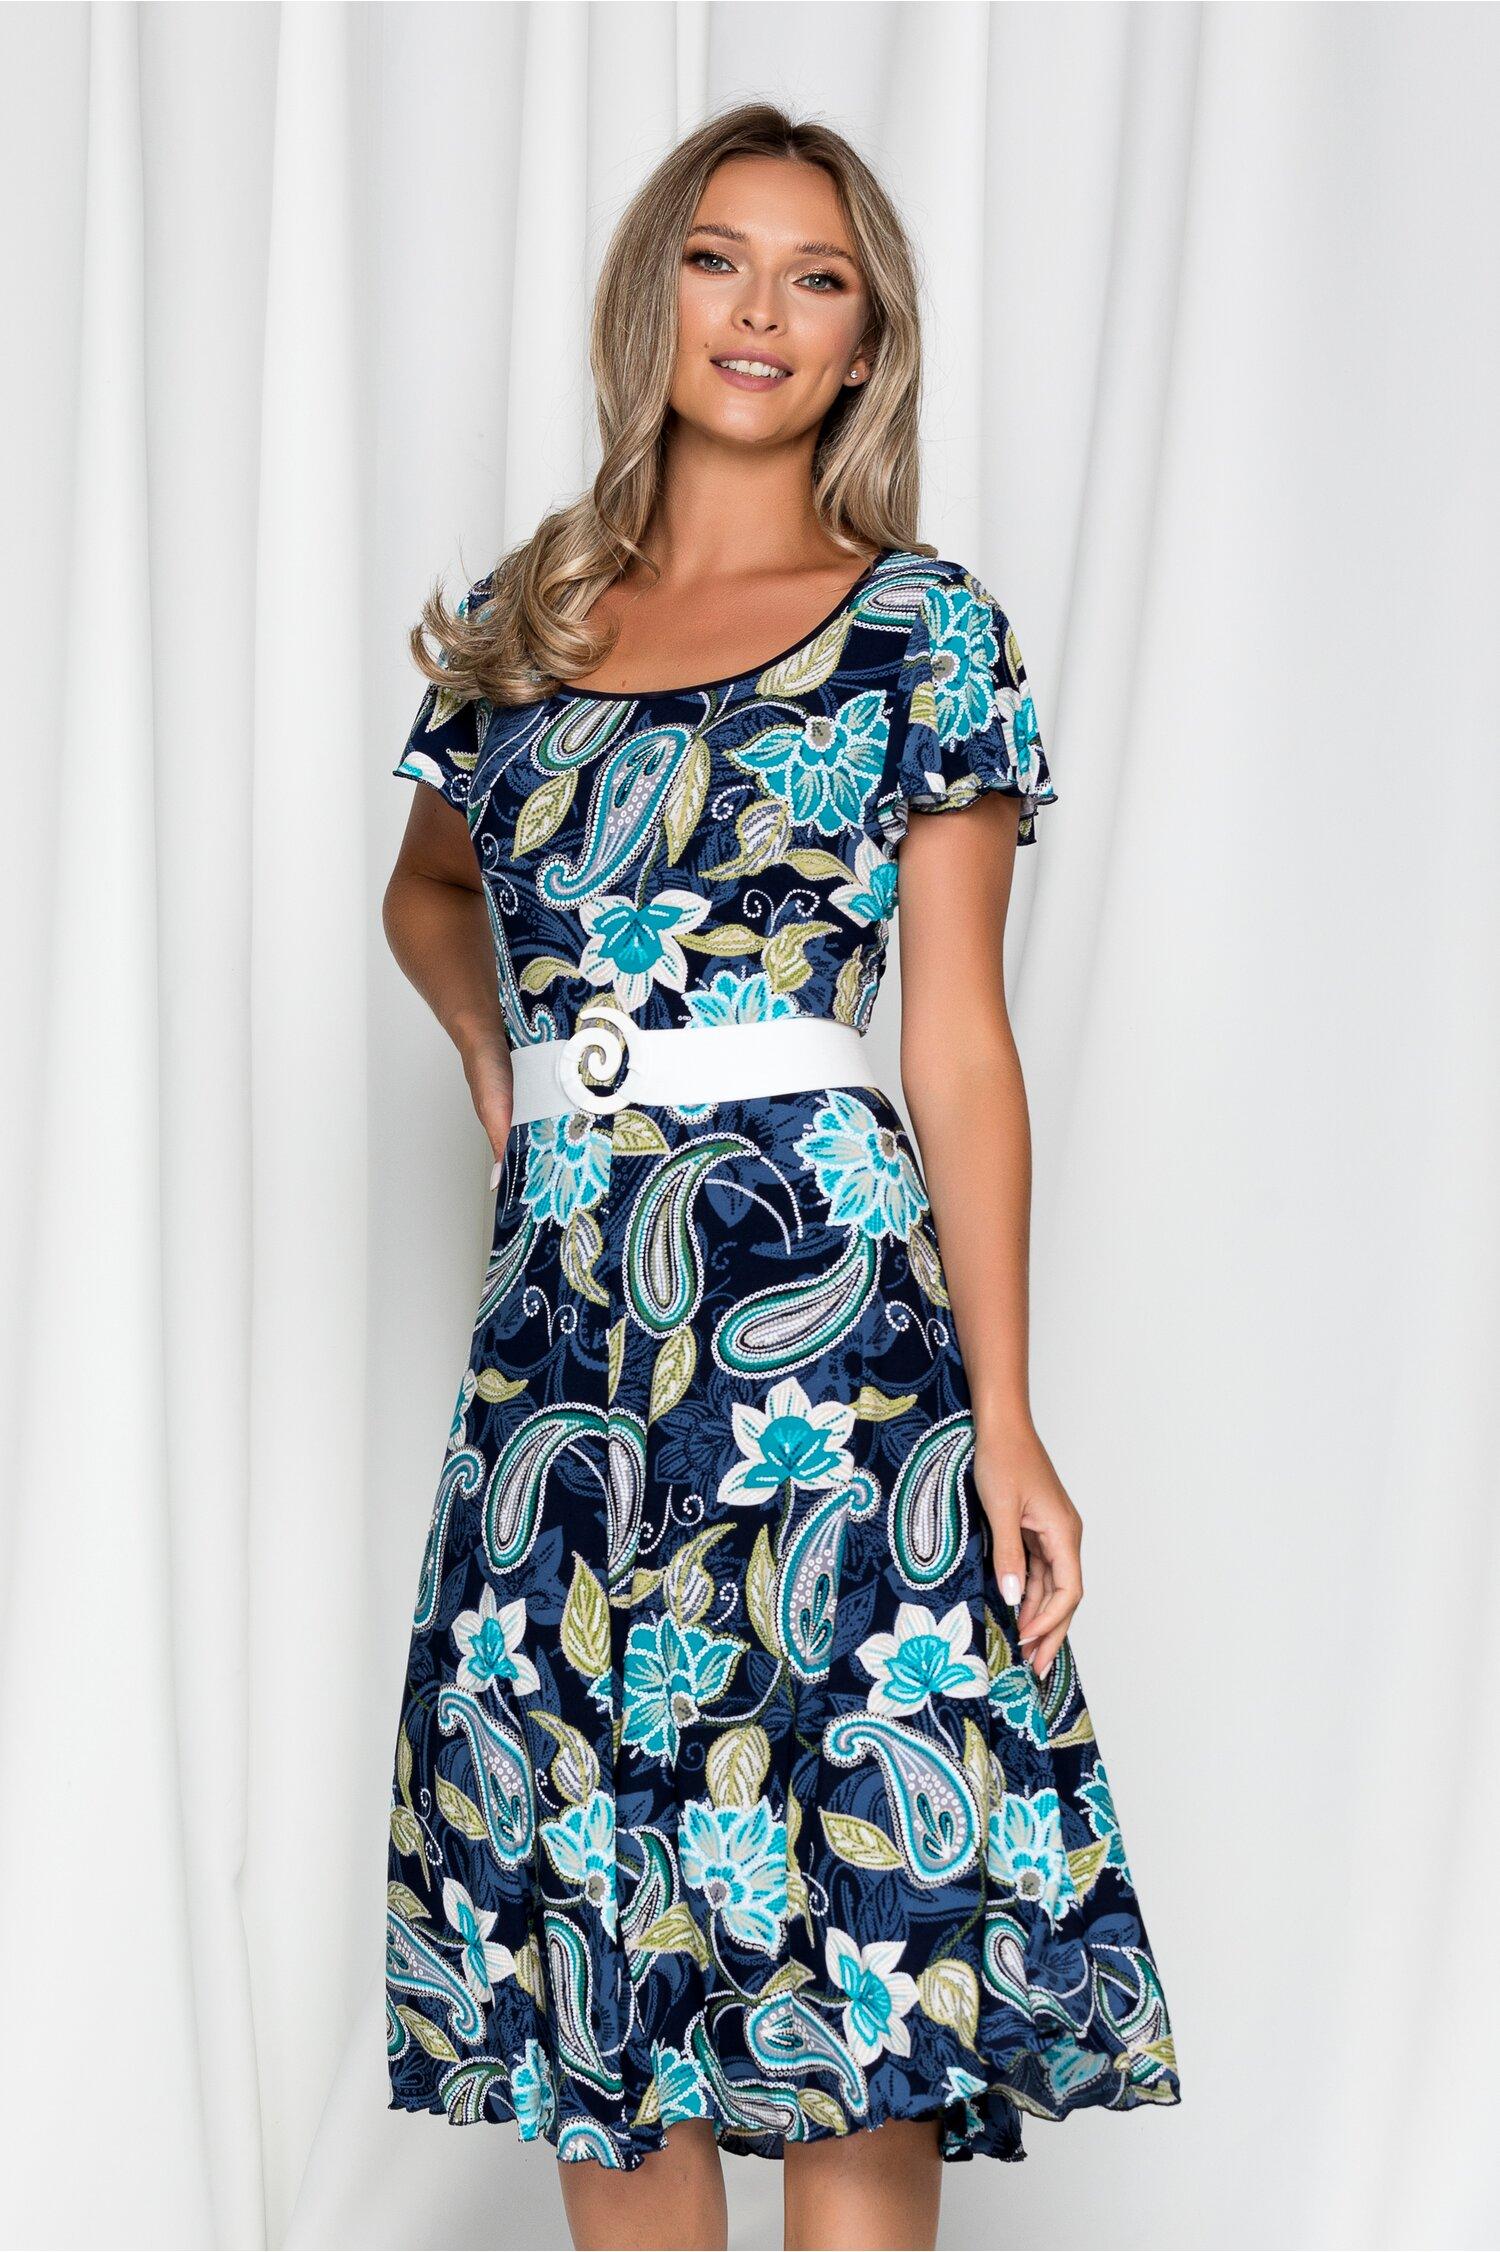 Rochie Karina bleumarin cu imprimeu floral turcoaz